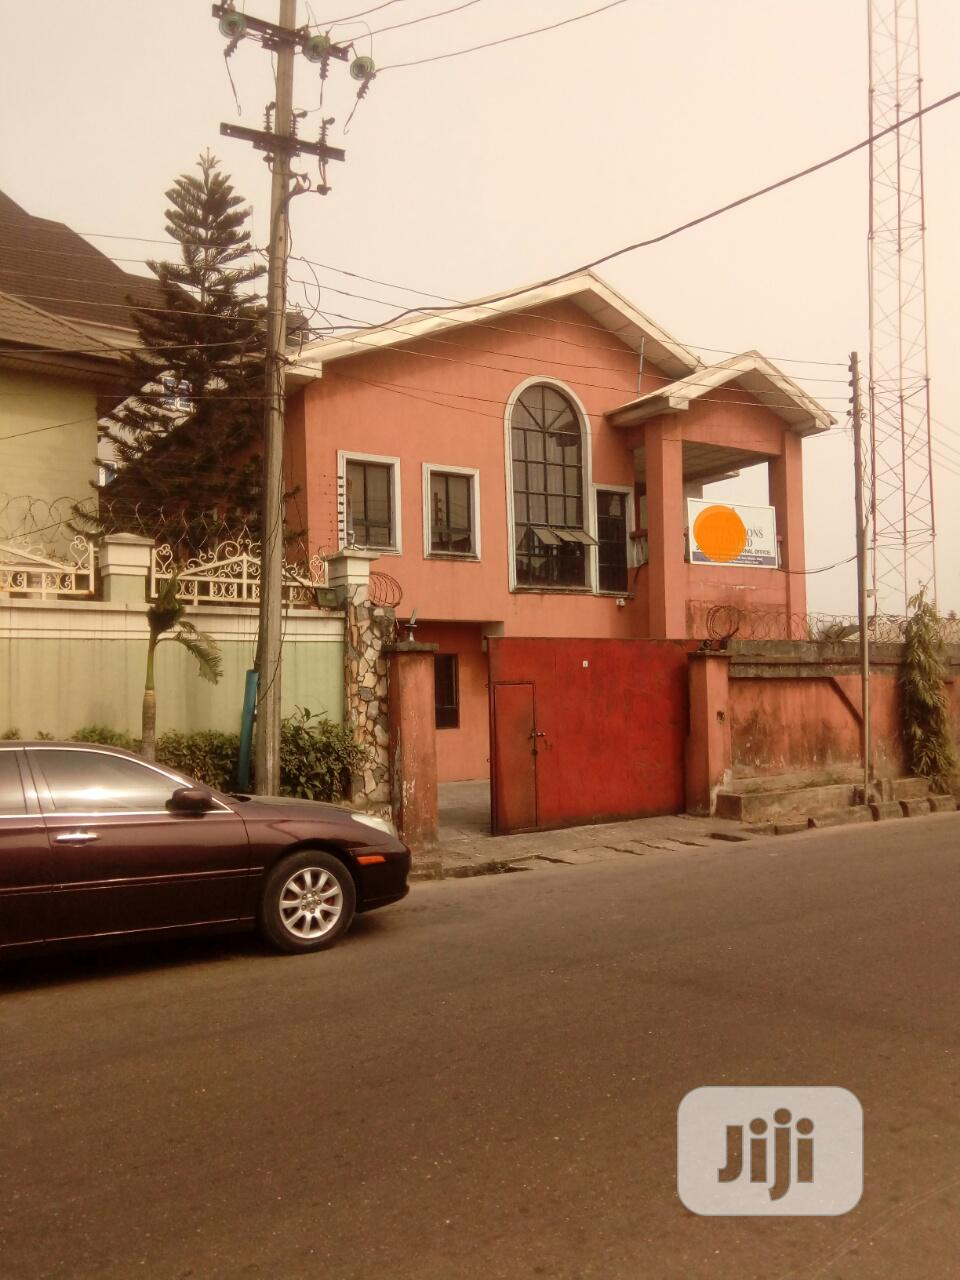 Distress Sale: 5 Bedroom Duplex For Sale In Gra, Ph